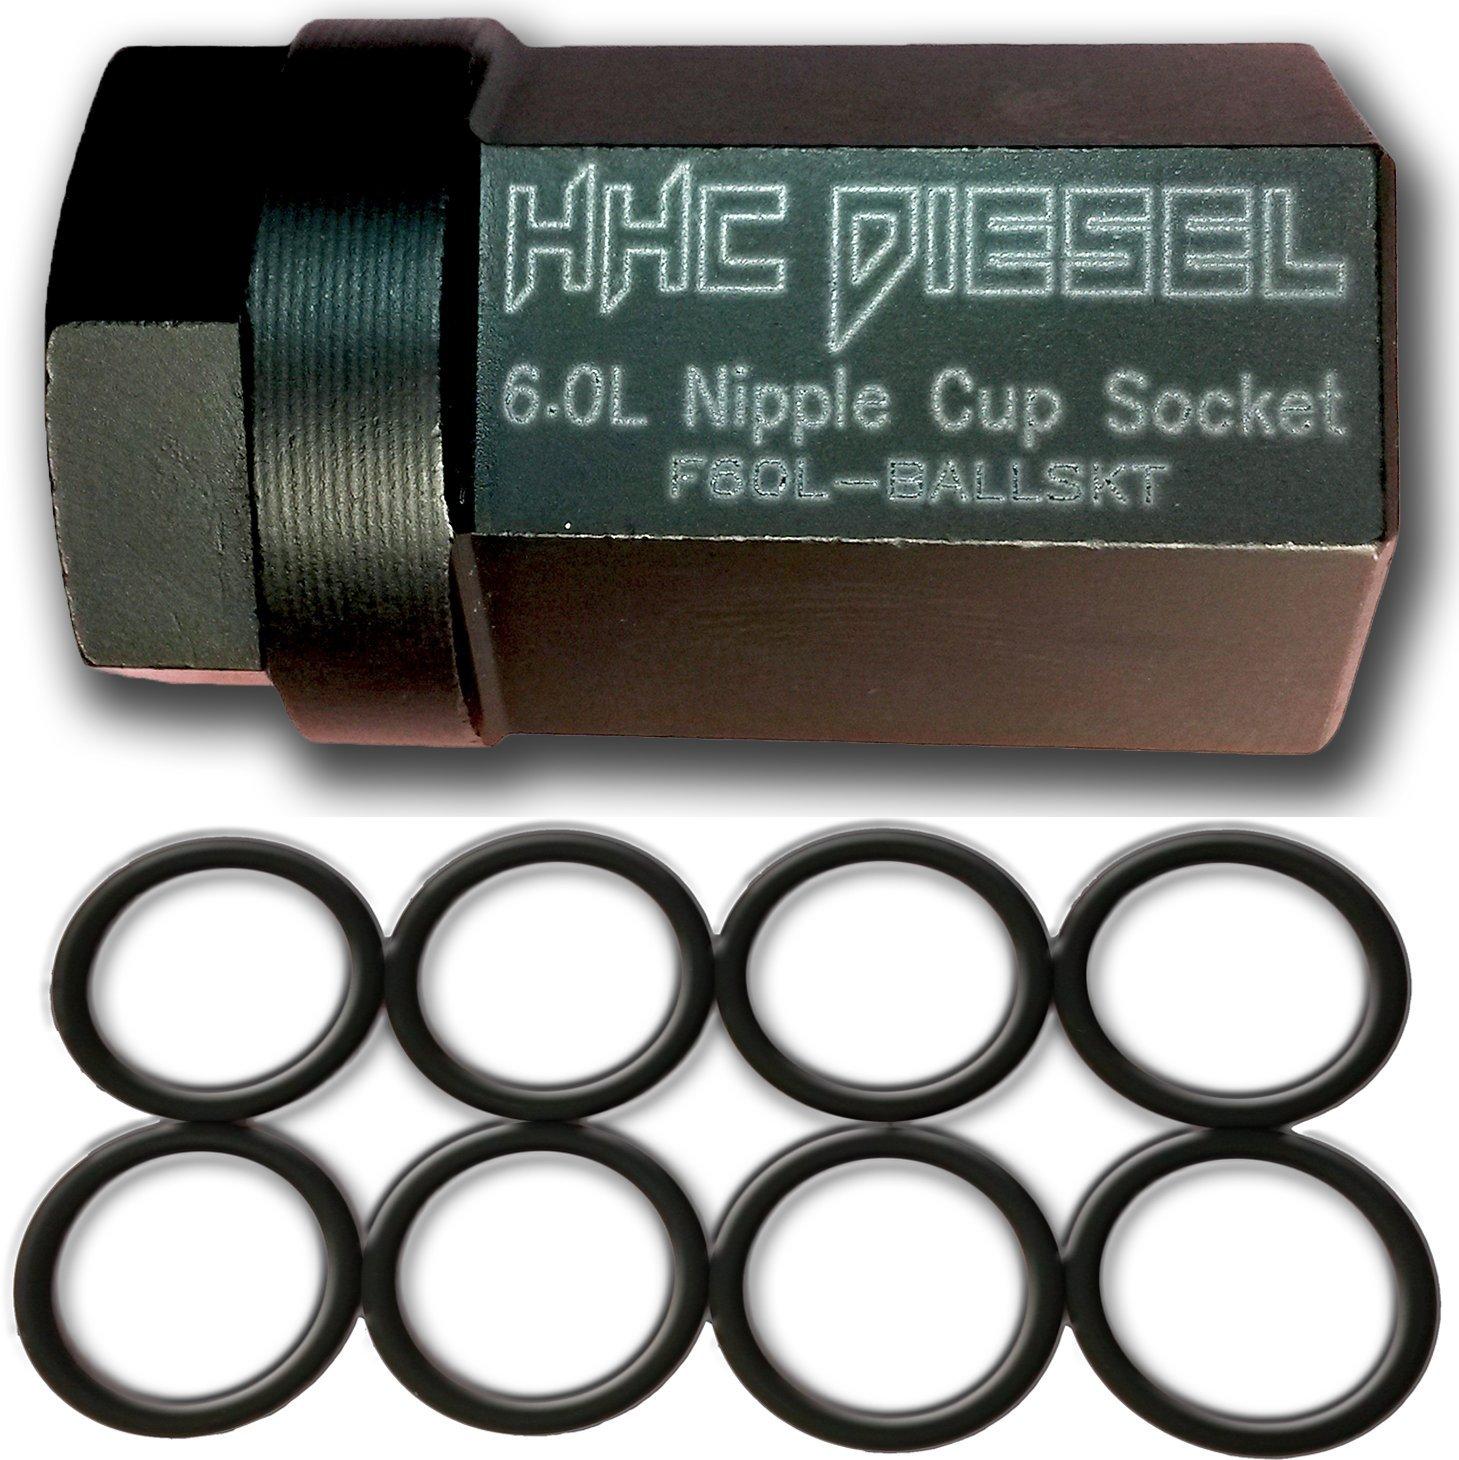 HHC Diesel ~Ford 6.0L Diesel Nipple Cup Socket Kit~ O-Rings & Tool (8: Heavy Duty Viton O-Rings & 1/2'' Drive Nipple Cup Socket) F60L-BALLKIT